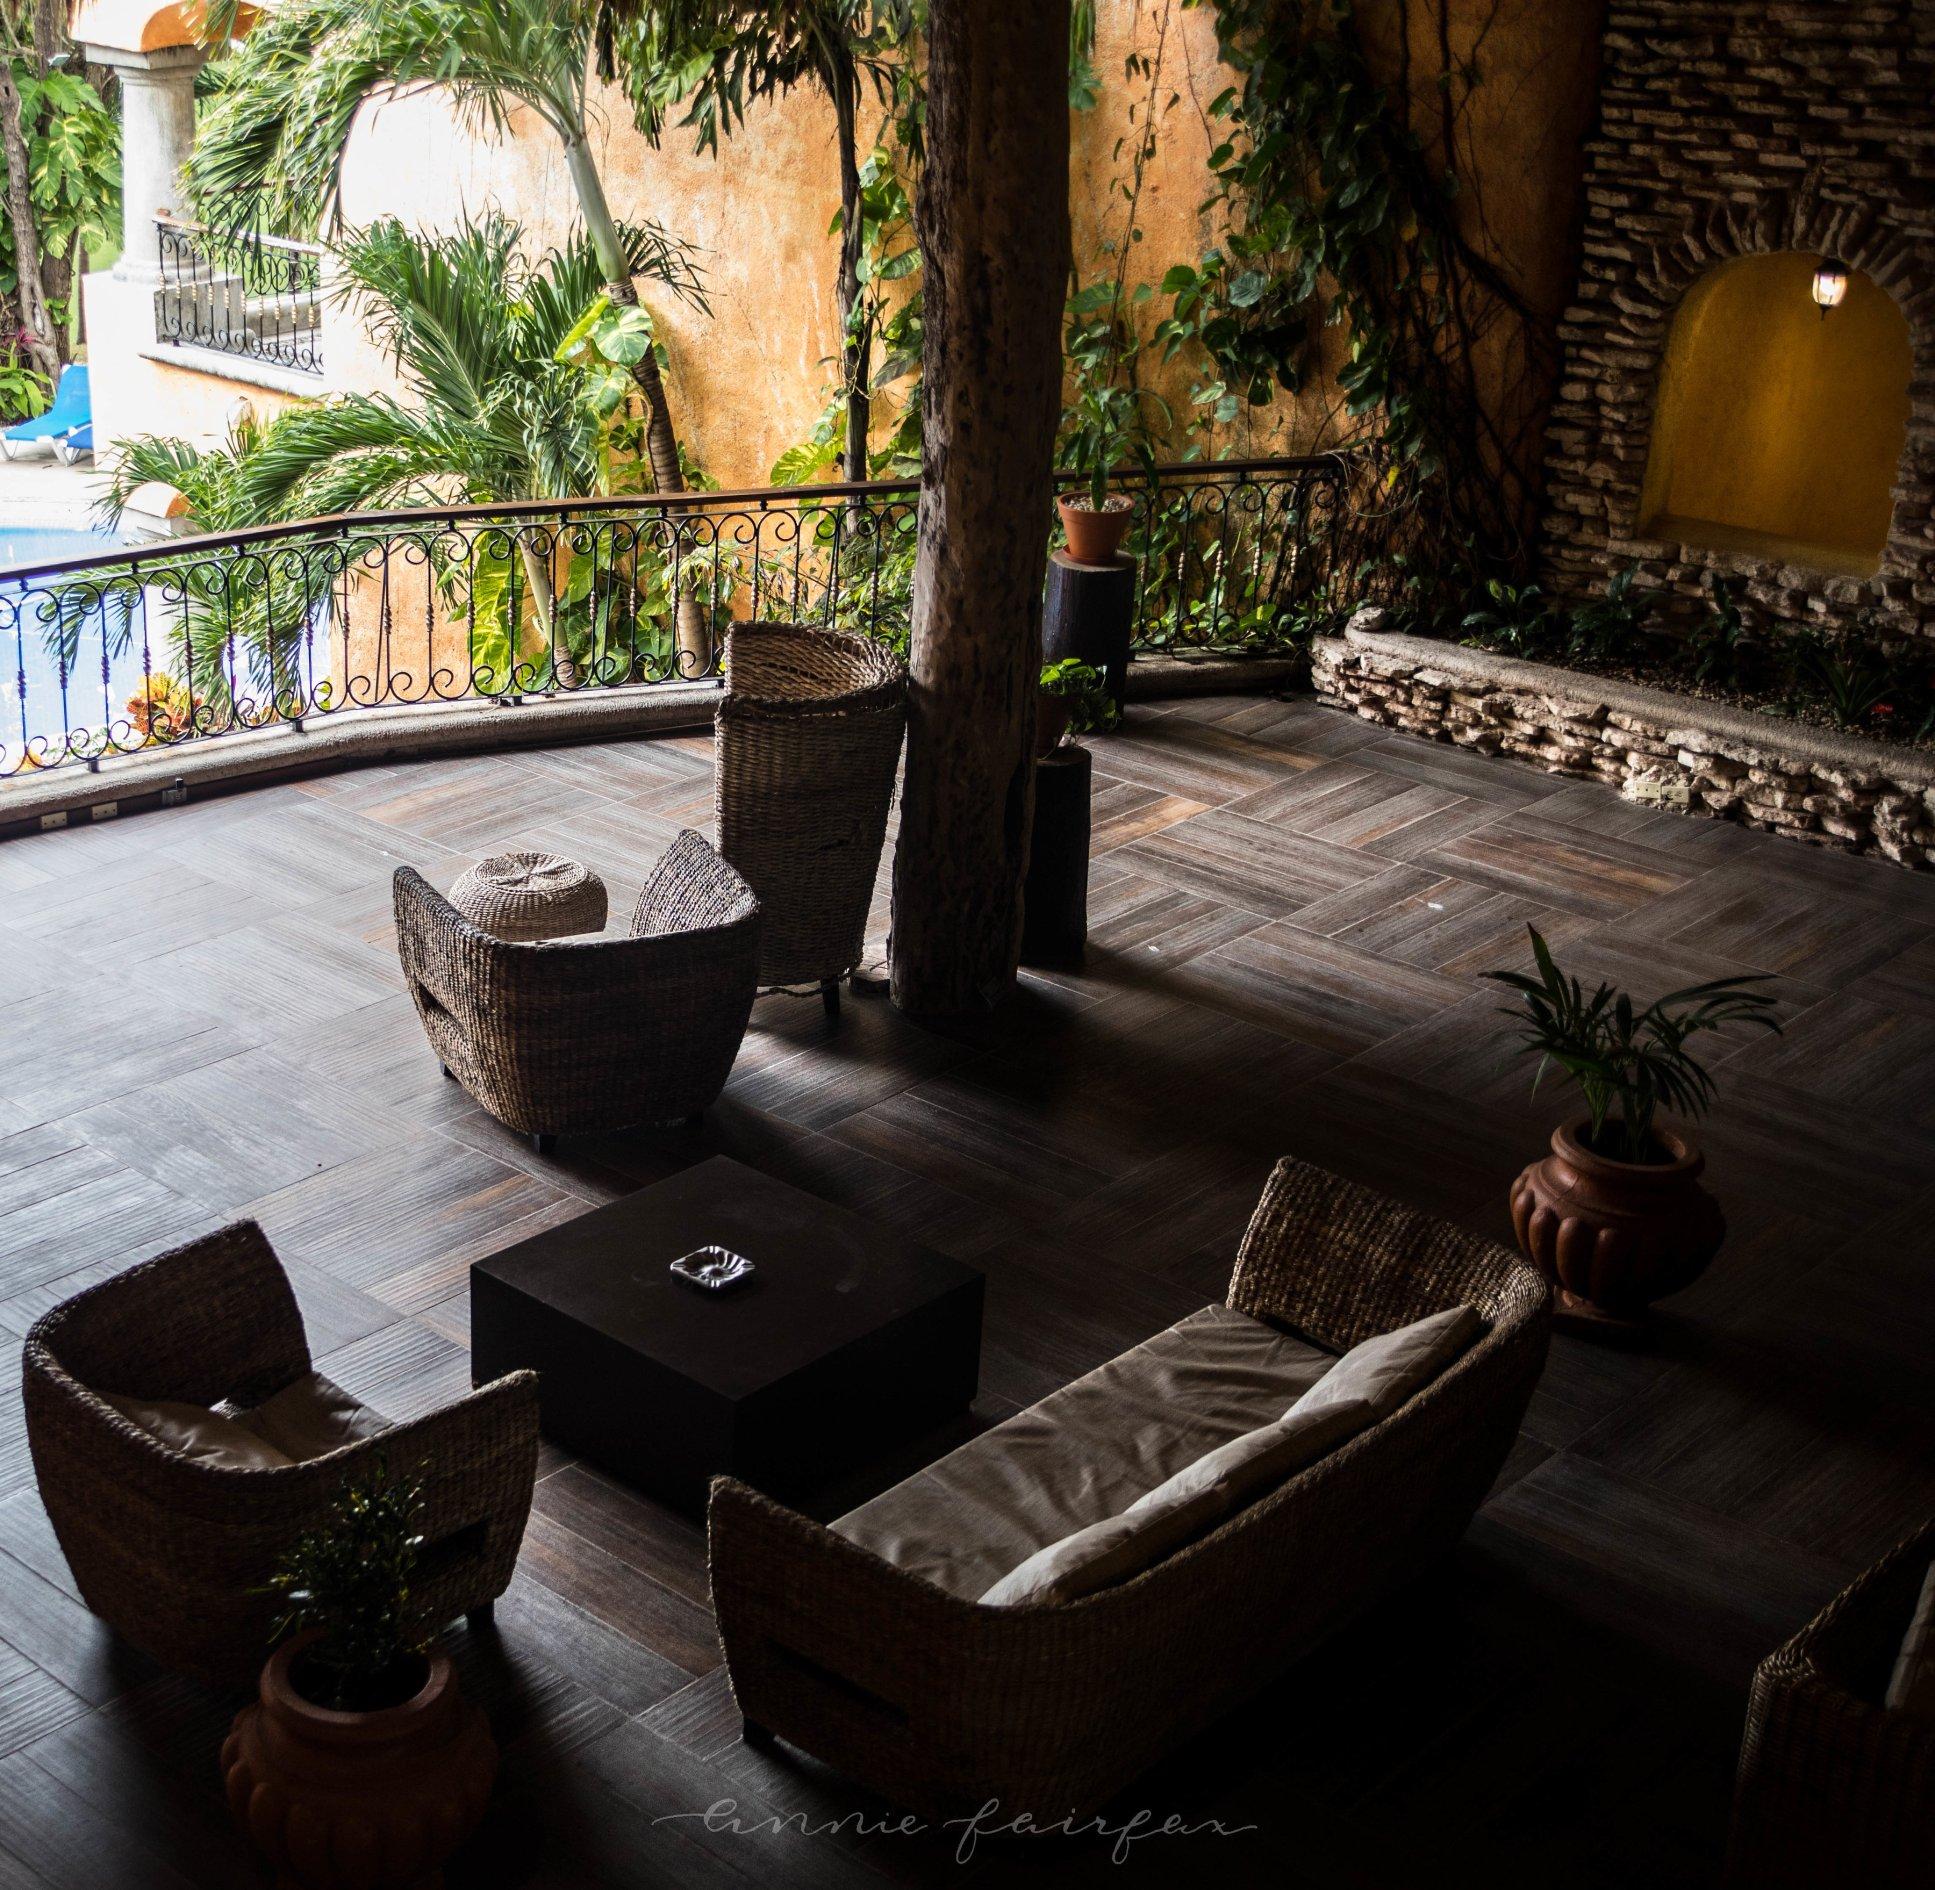 Hacienda Vista Real in Playa del Carmen: Luxury Hotels of the World